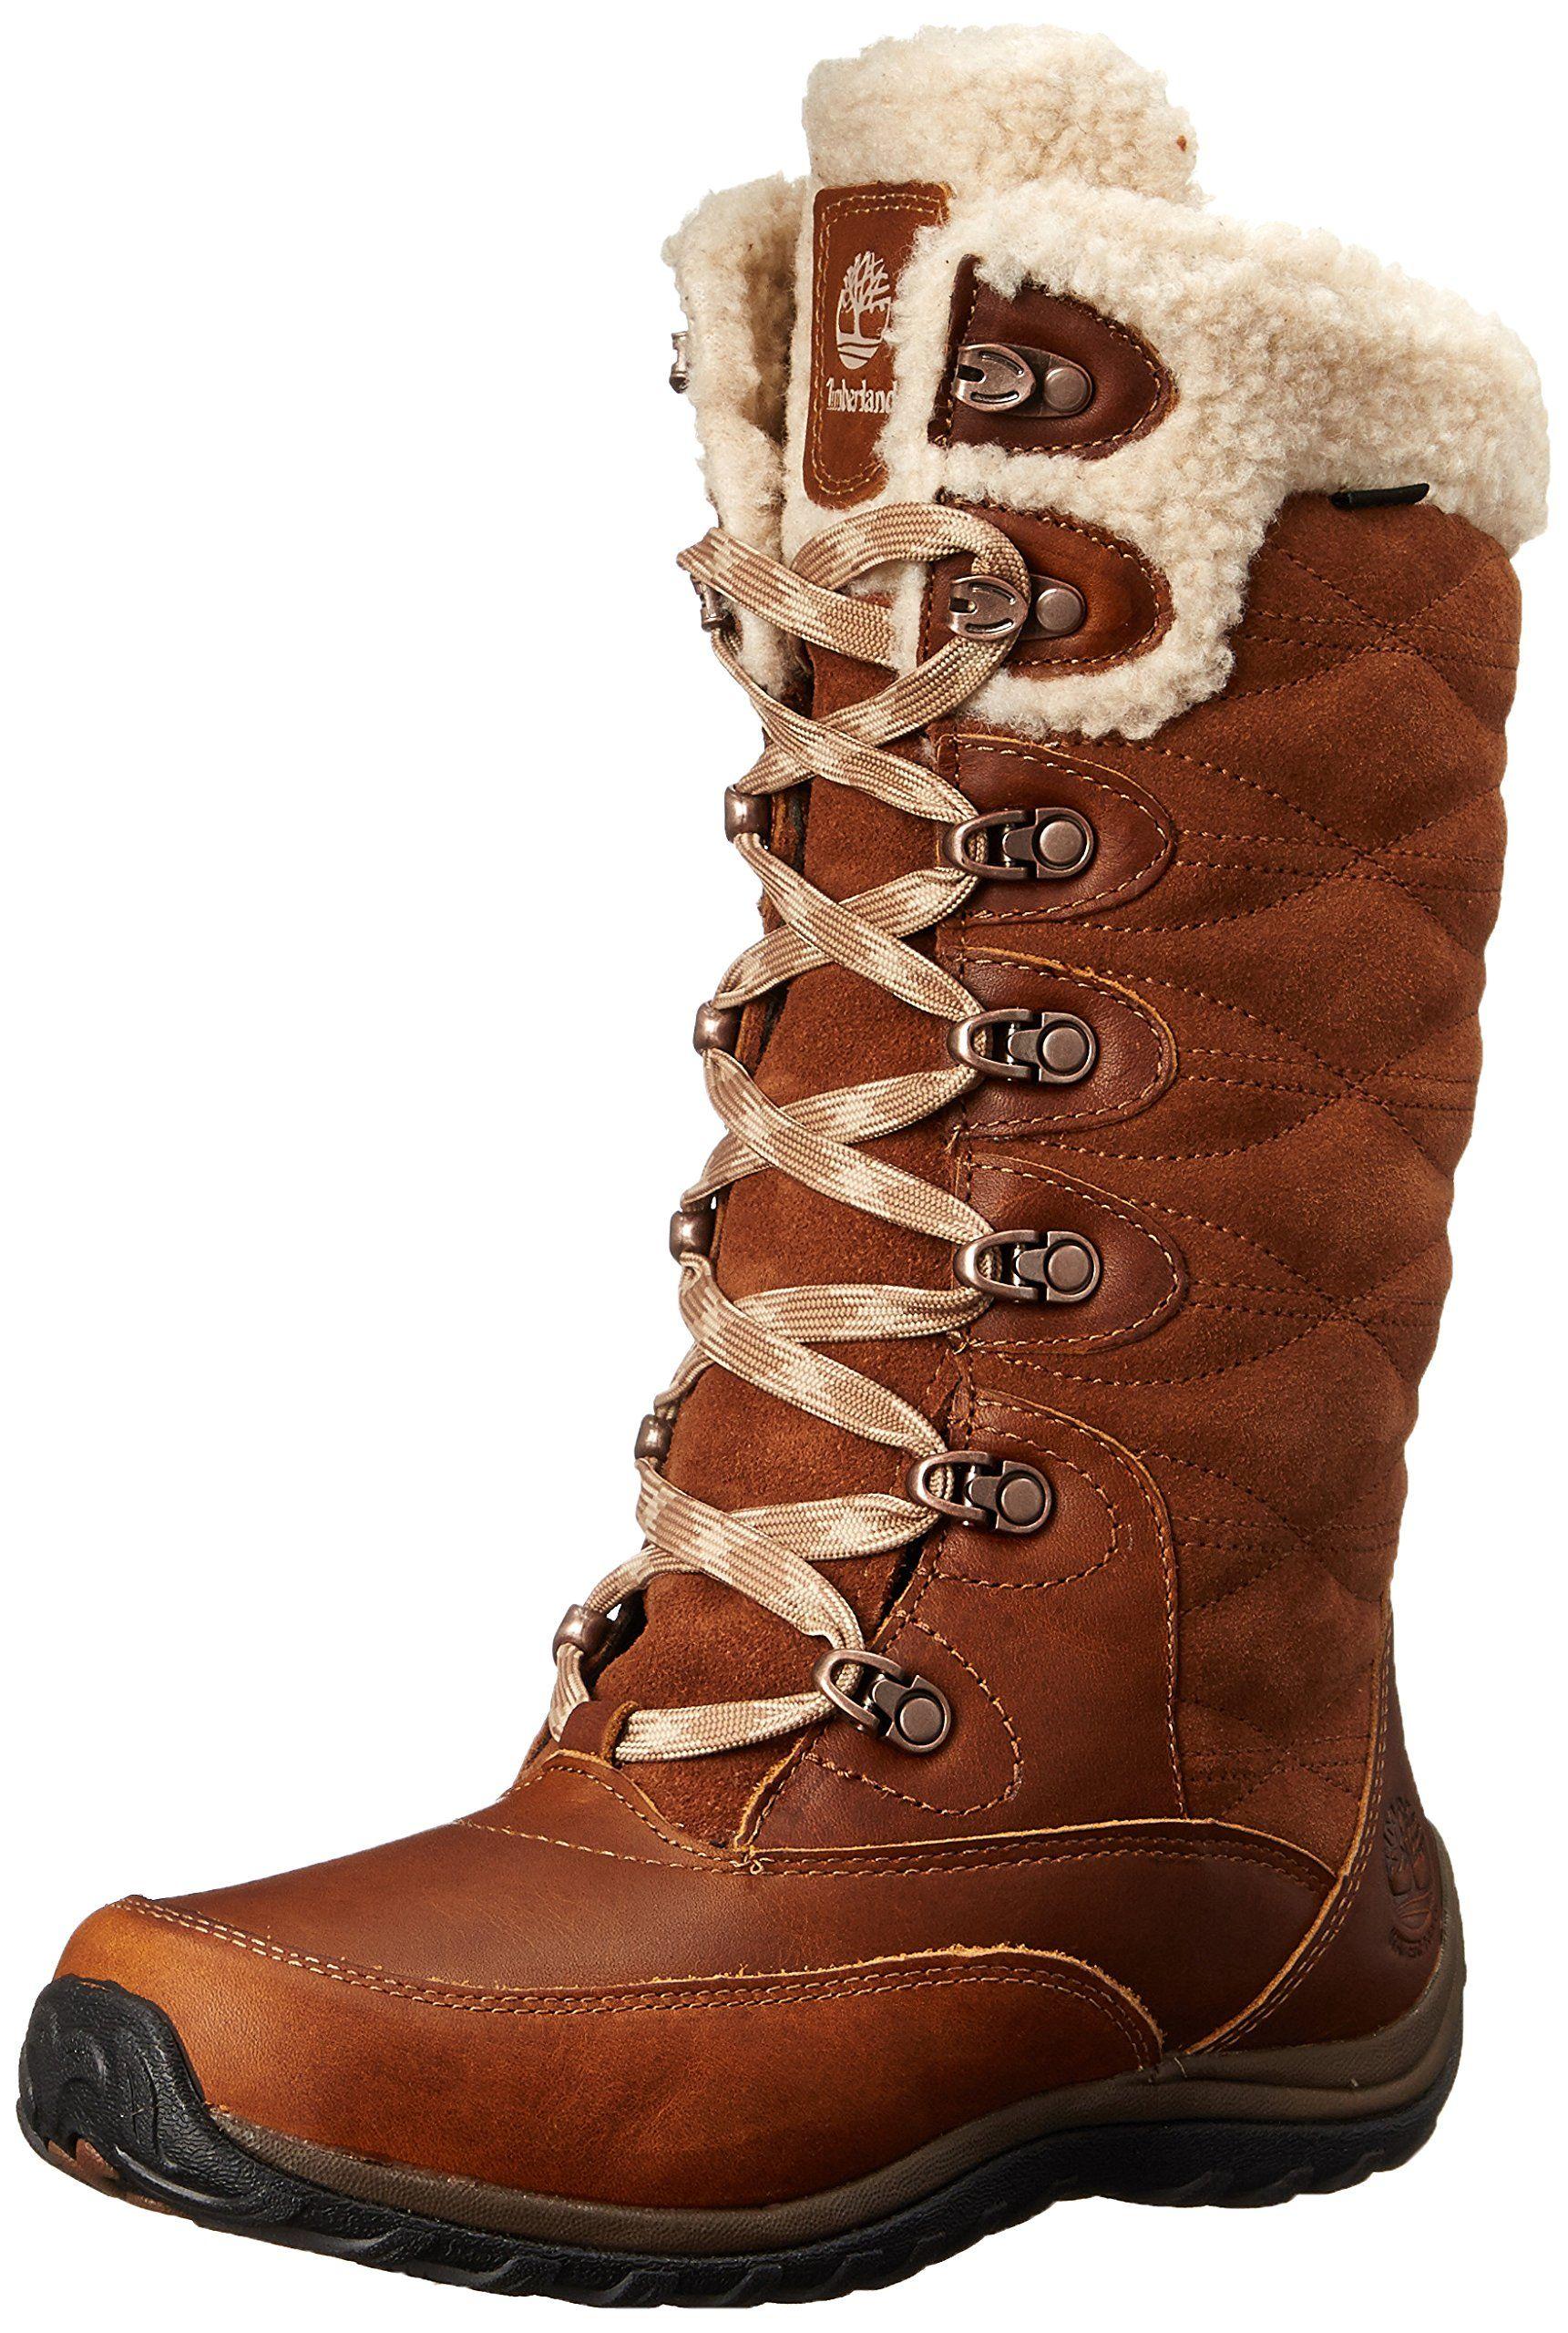 Timberland Womens Willowood WP Insulated Winter Boot Brown 7 W US Womens Combat BootsCalf